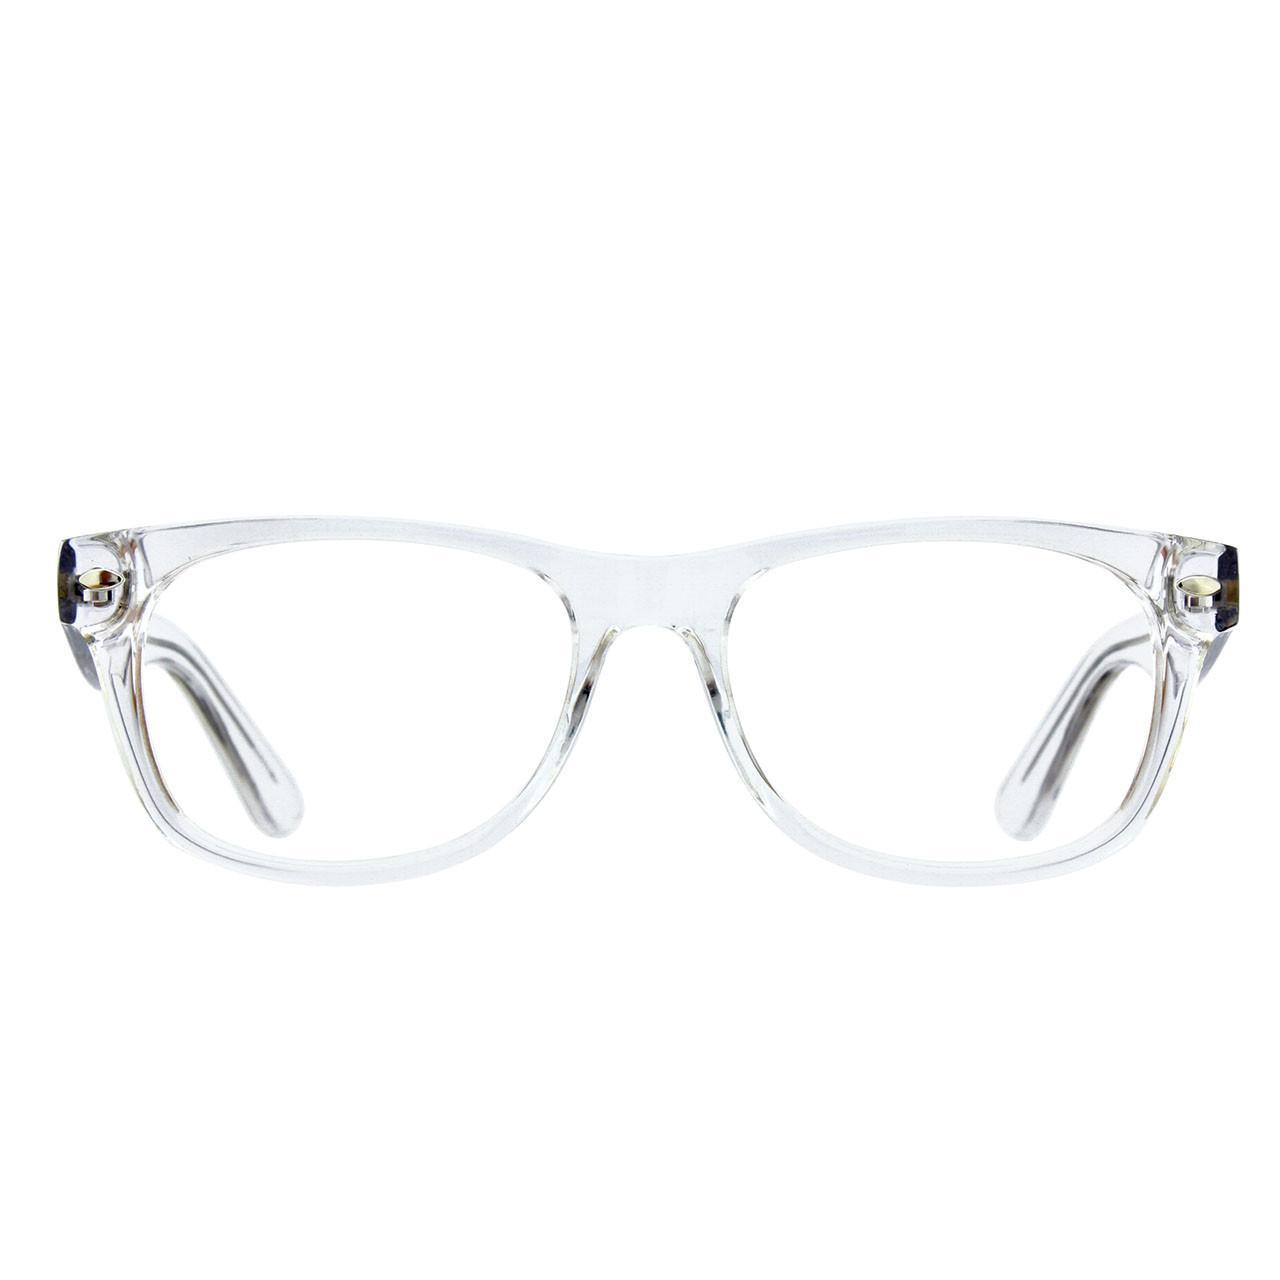 GEEK Eyewear Geek RAD 09 Crystal Clear